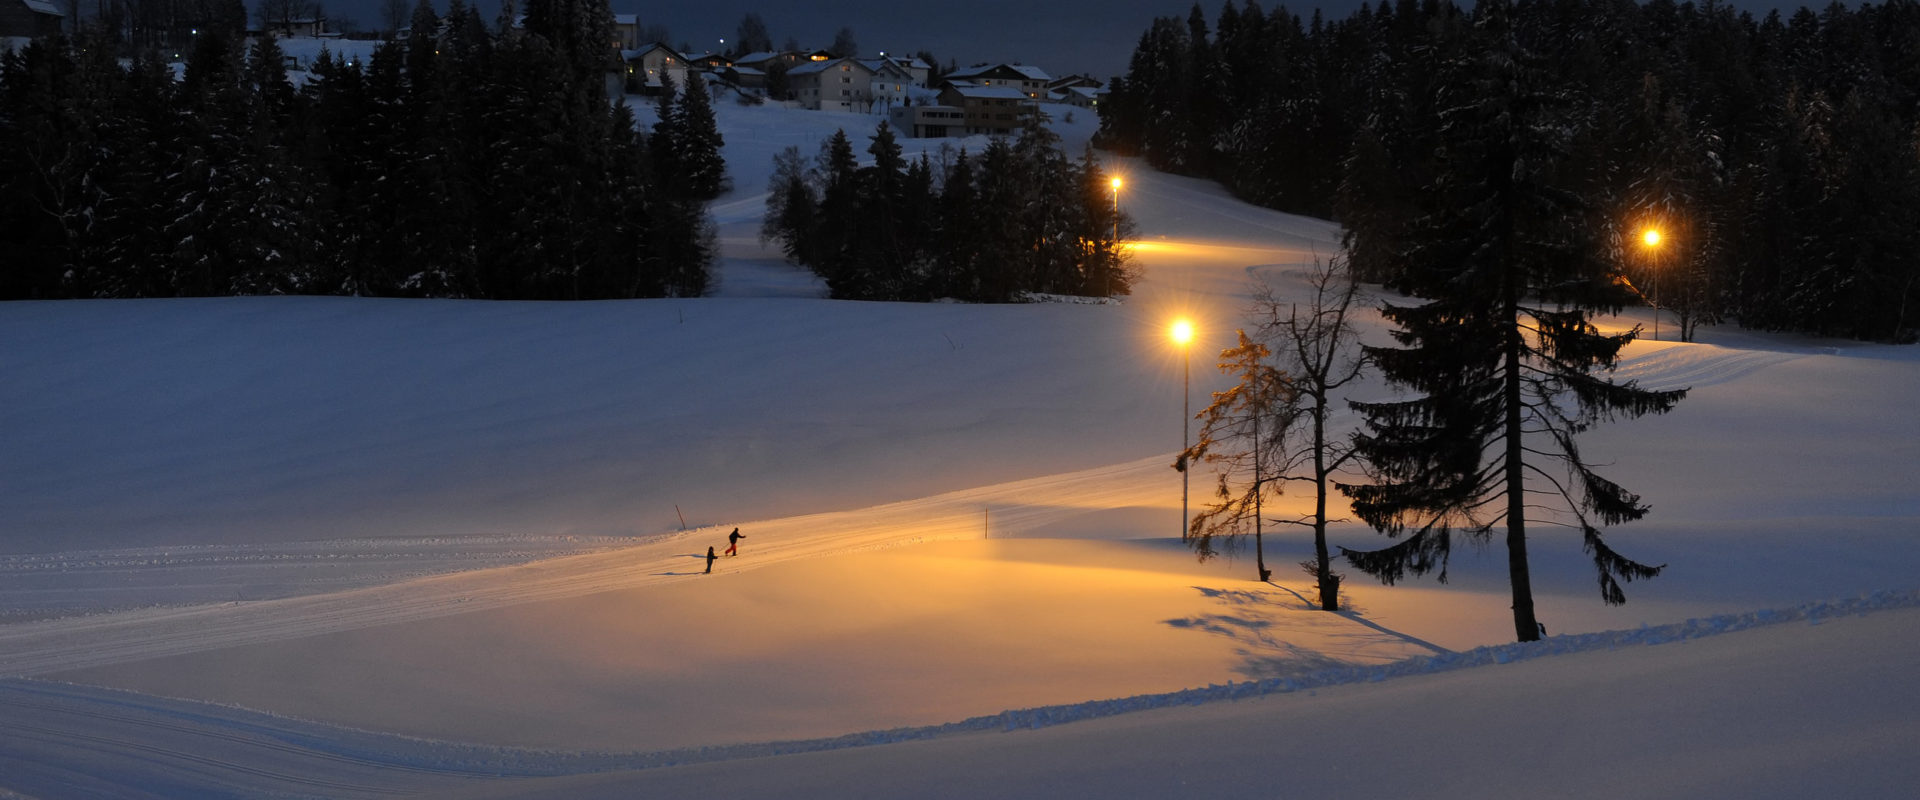 Nordic Sports Park in Sulzberg © Thomas Gretler / Sulzberg Tourismus